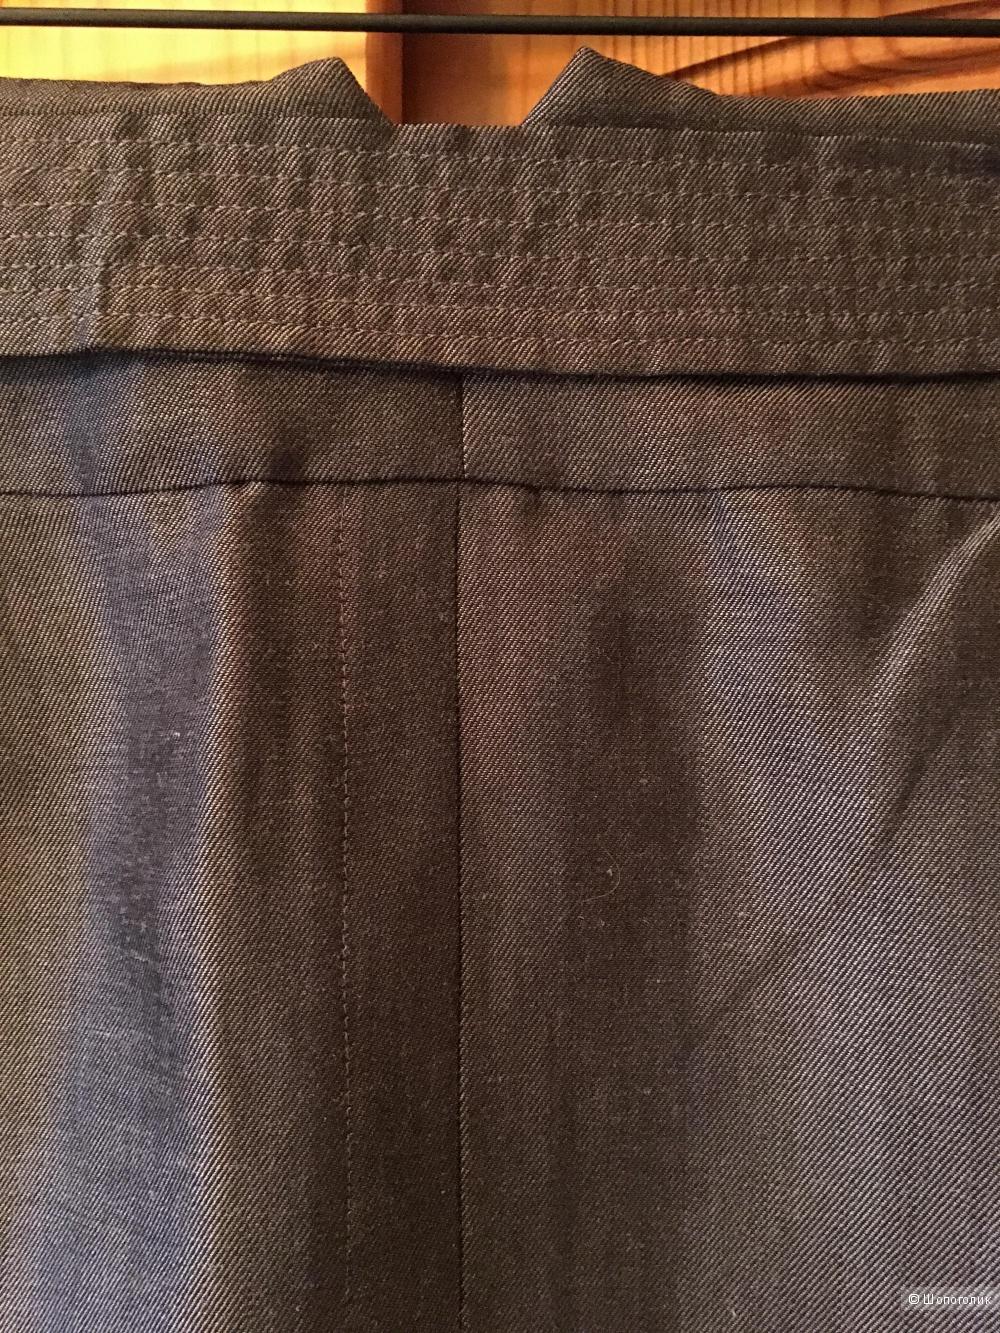 Юбка-карандаш шерсть/рами TURNOVER размер D36